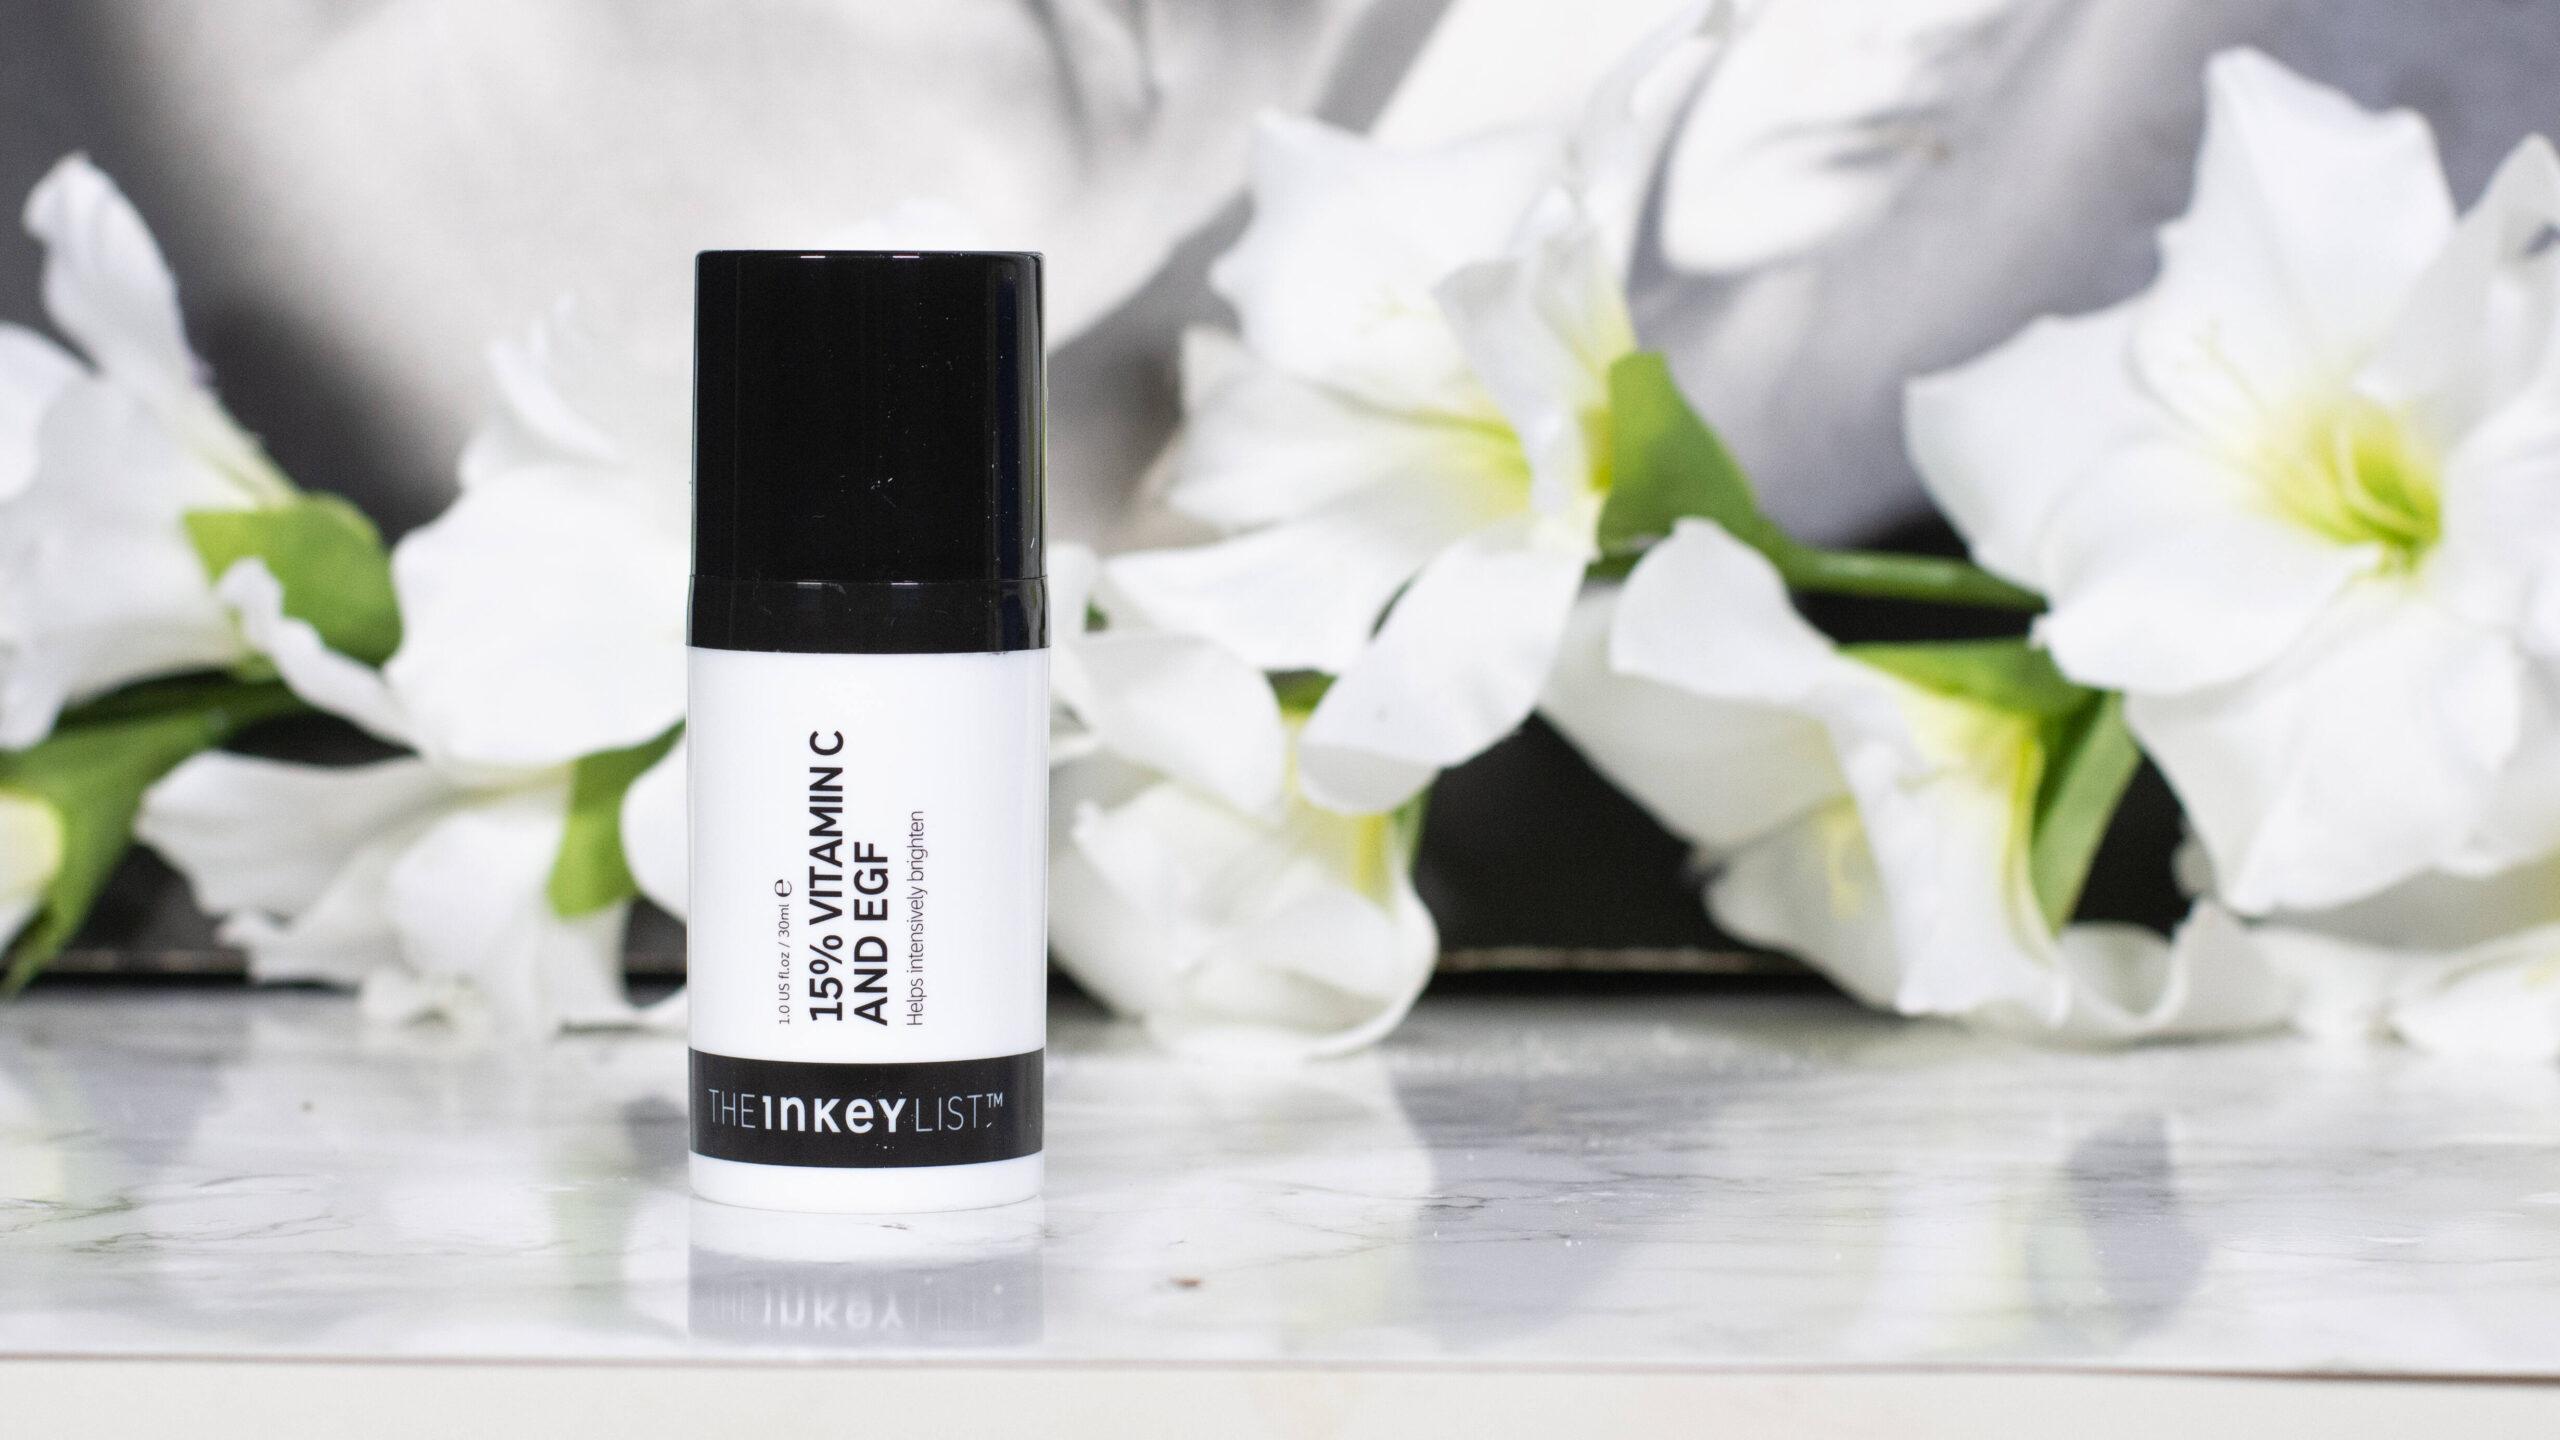 The Inkey List 15% Vitamin C and EGF Brightening Serum Review